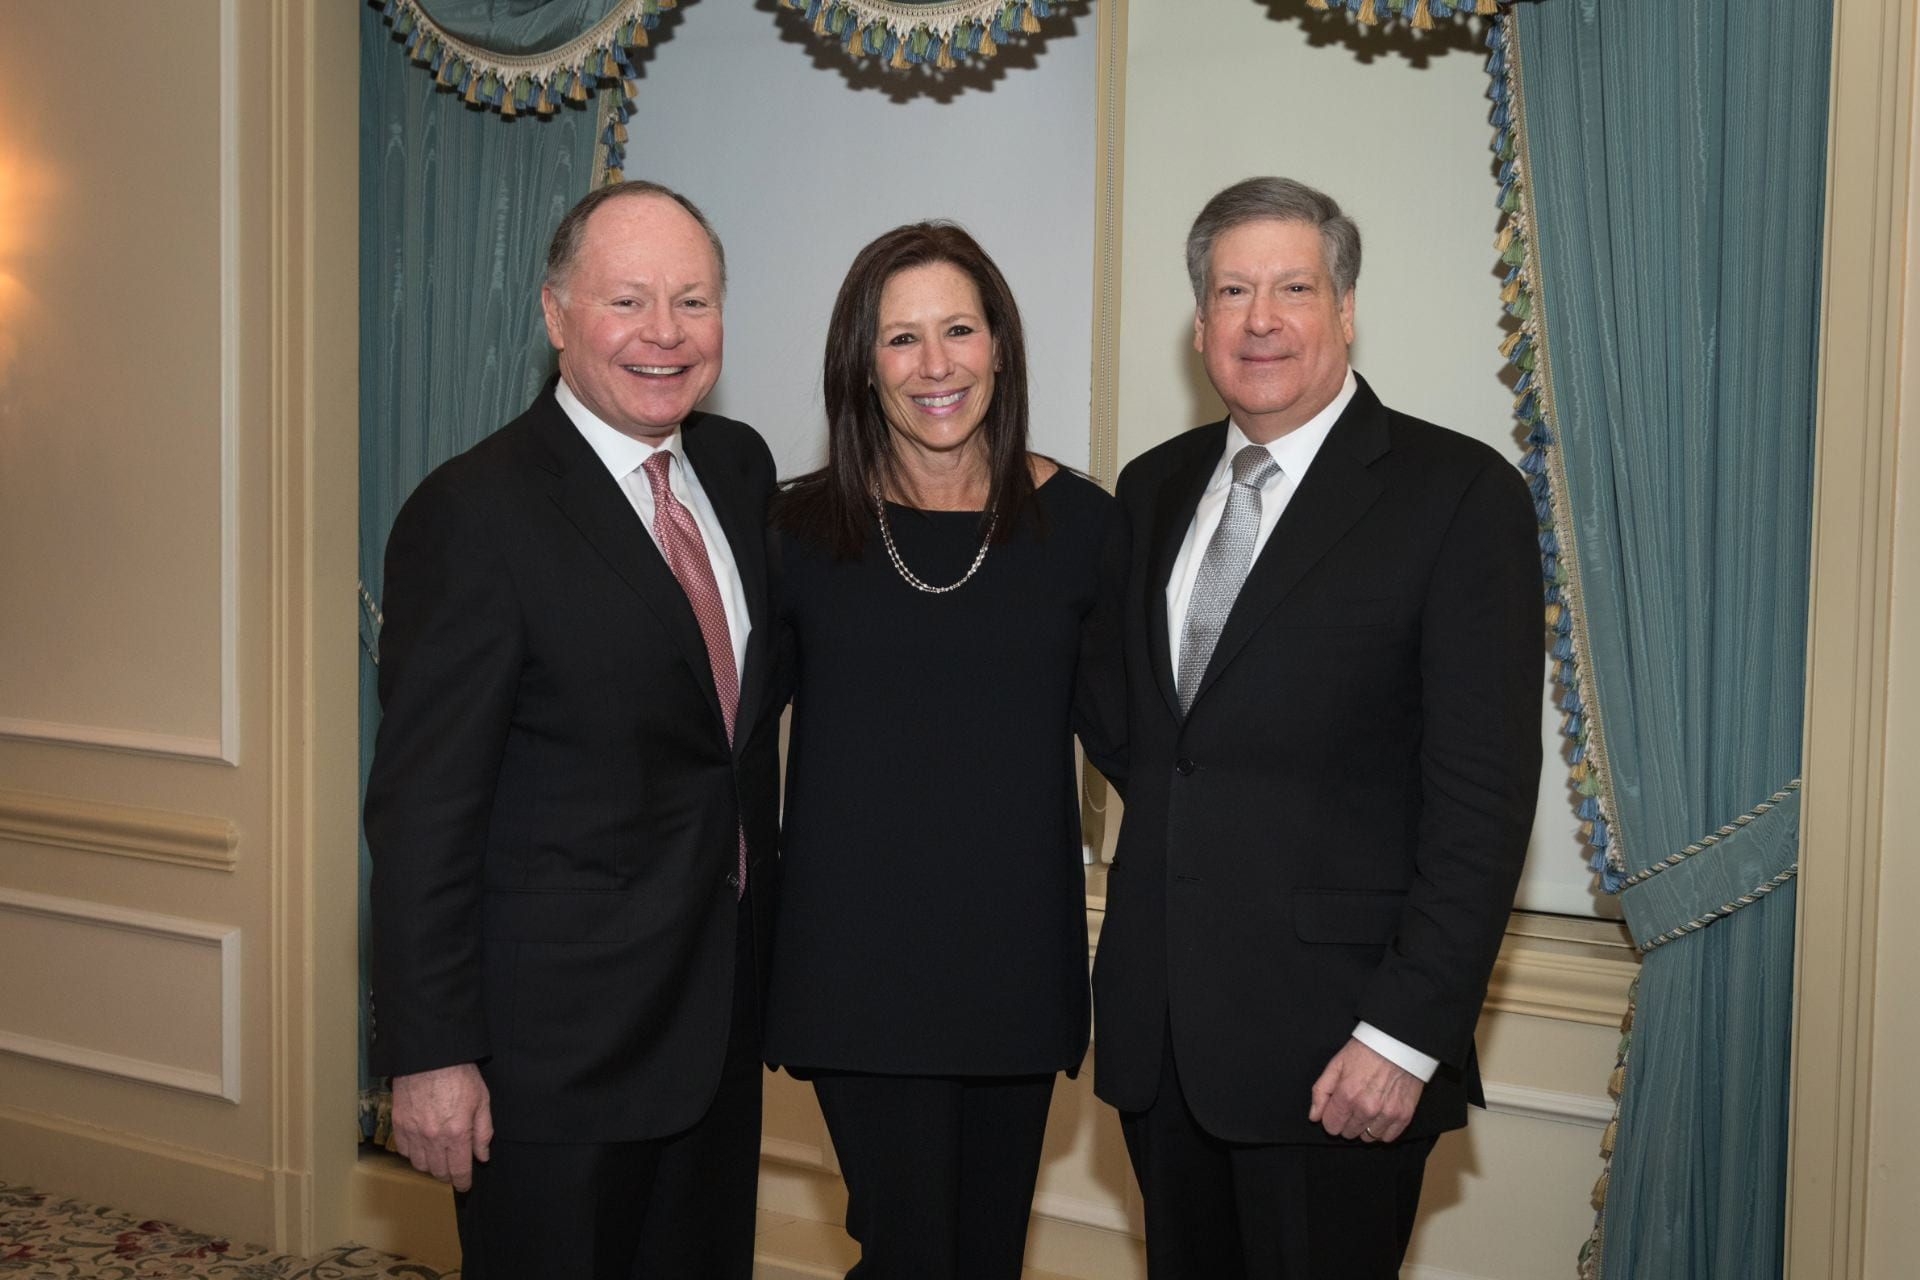 Andy Bursky, Jane Bursky, and Bob Schreiber